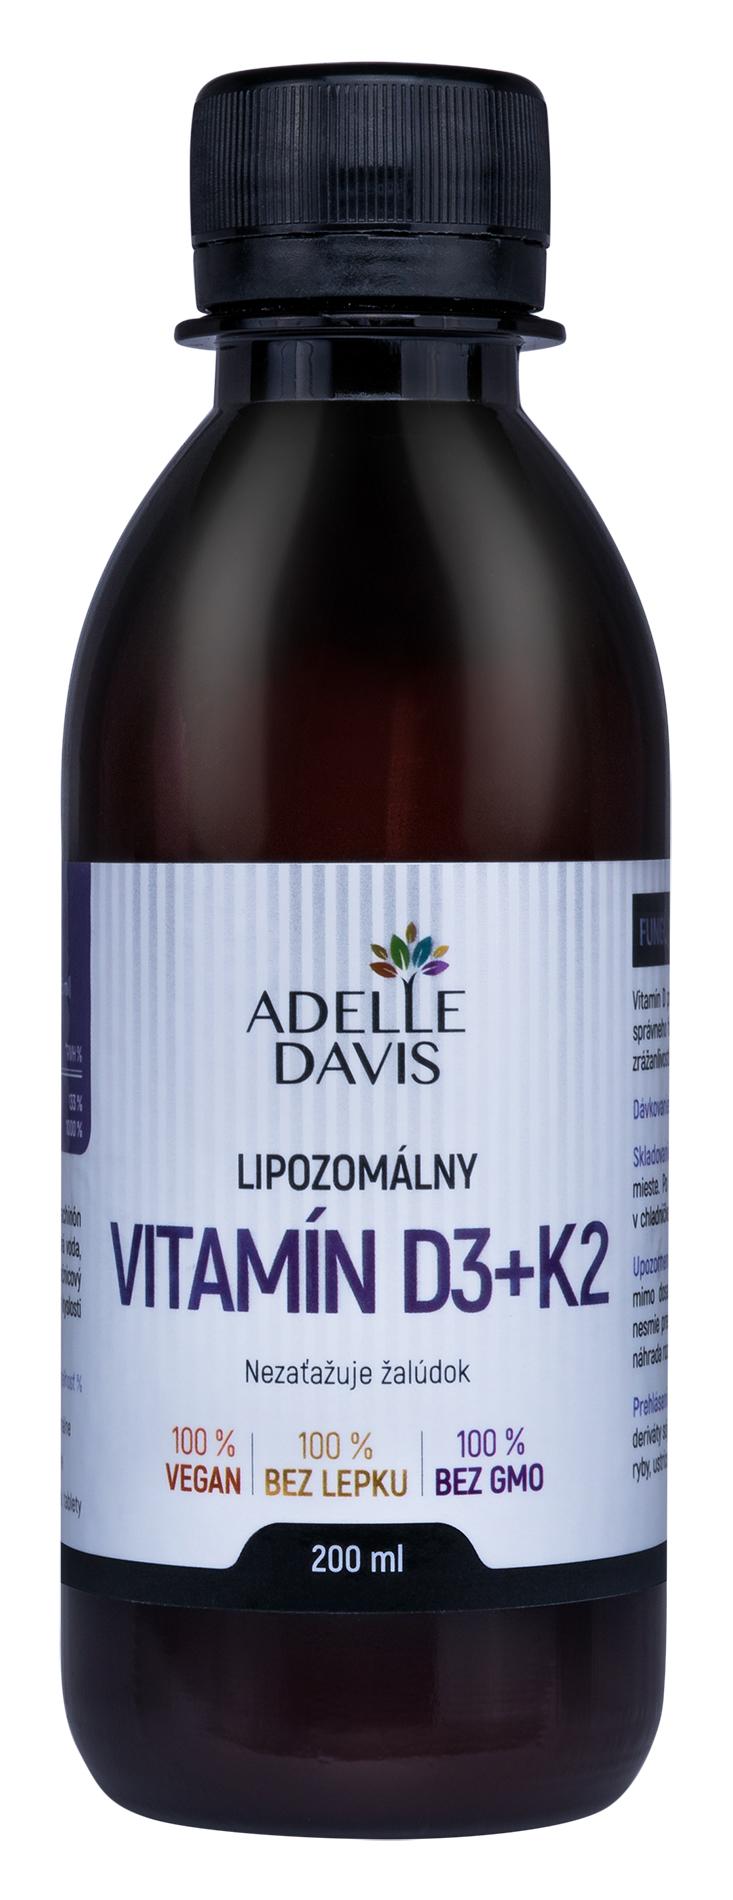 Adelle Davis Lipozomálny vitamín D3+K2 200ml